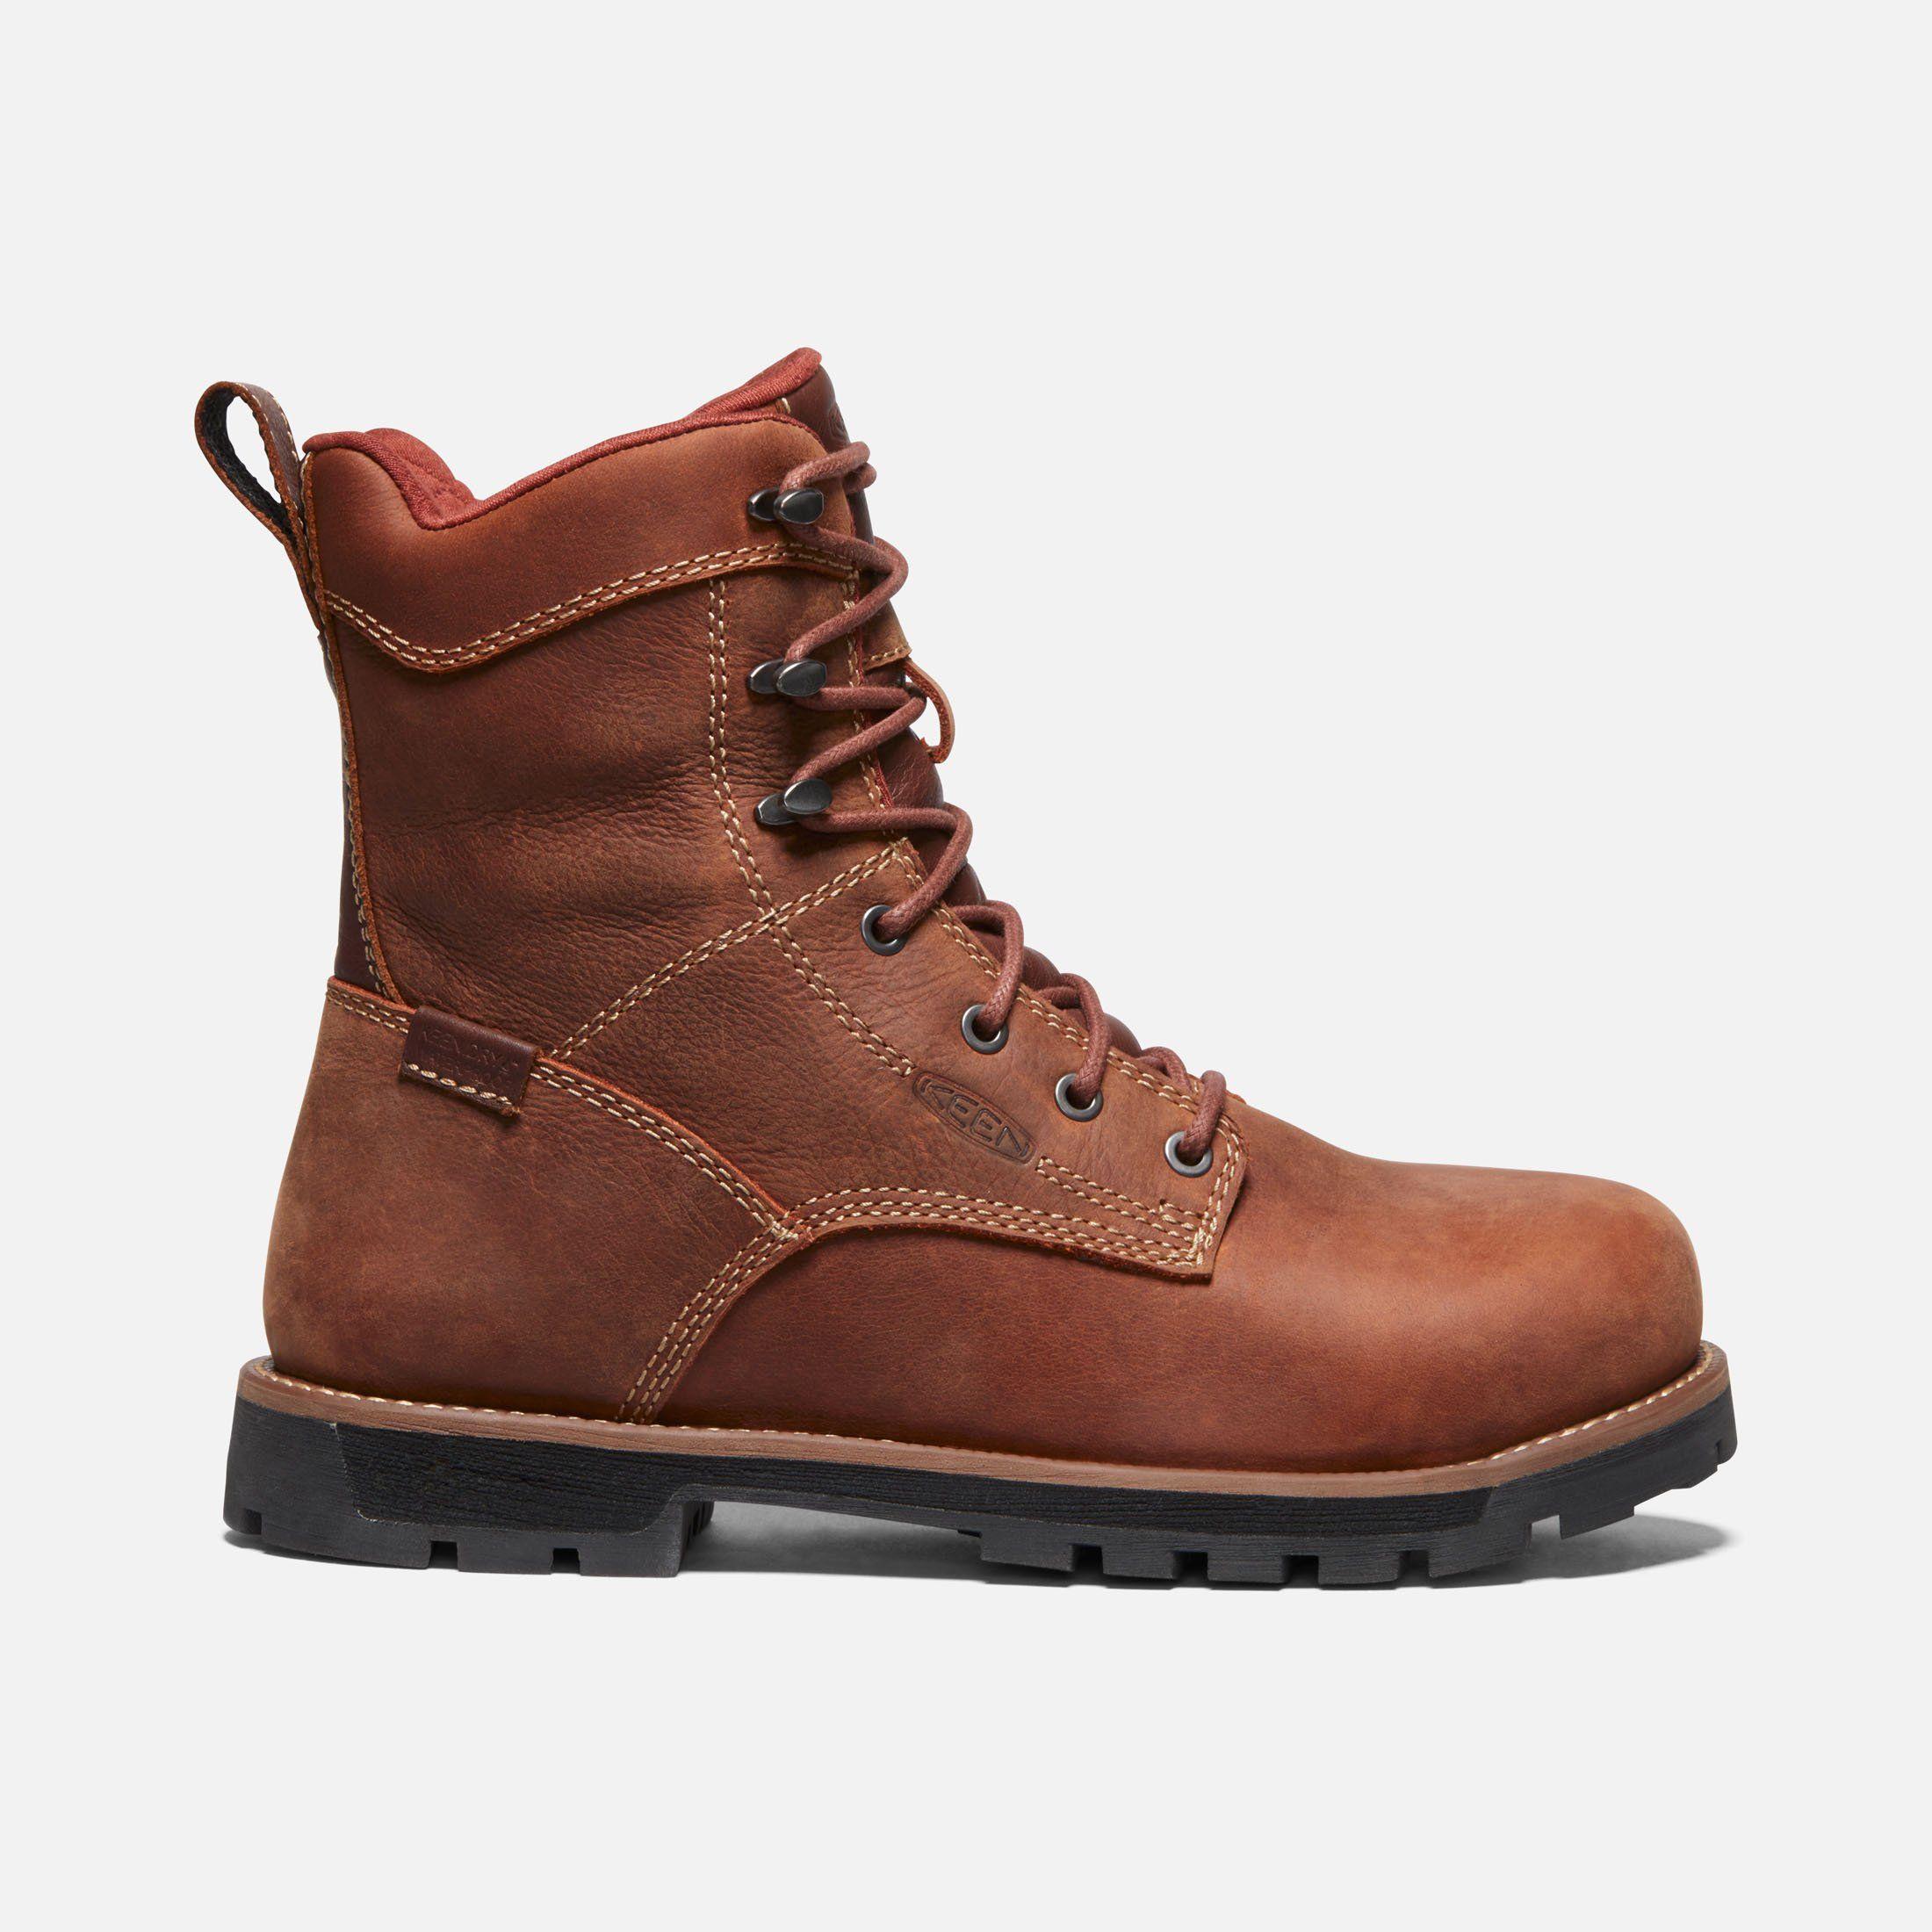 Boot (Aluminum Toe) Size